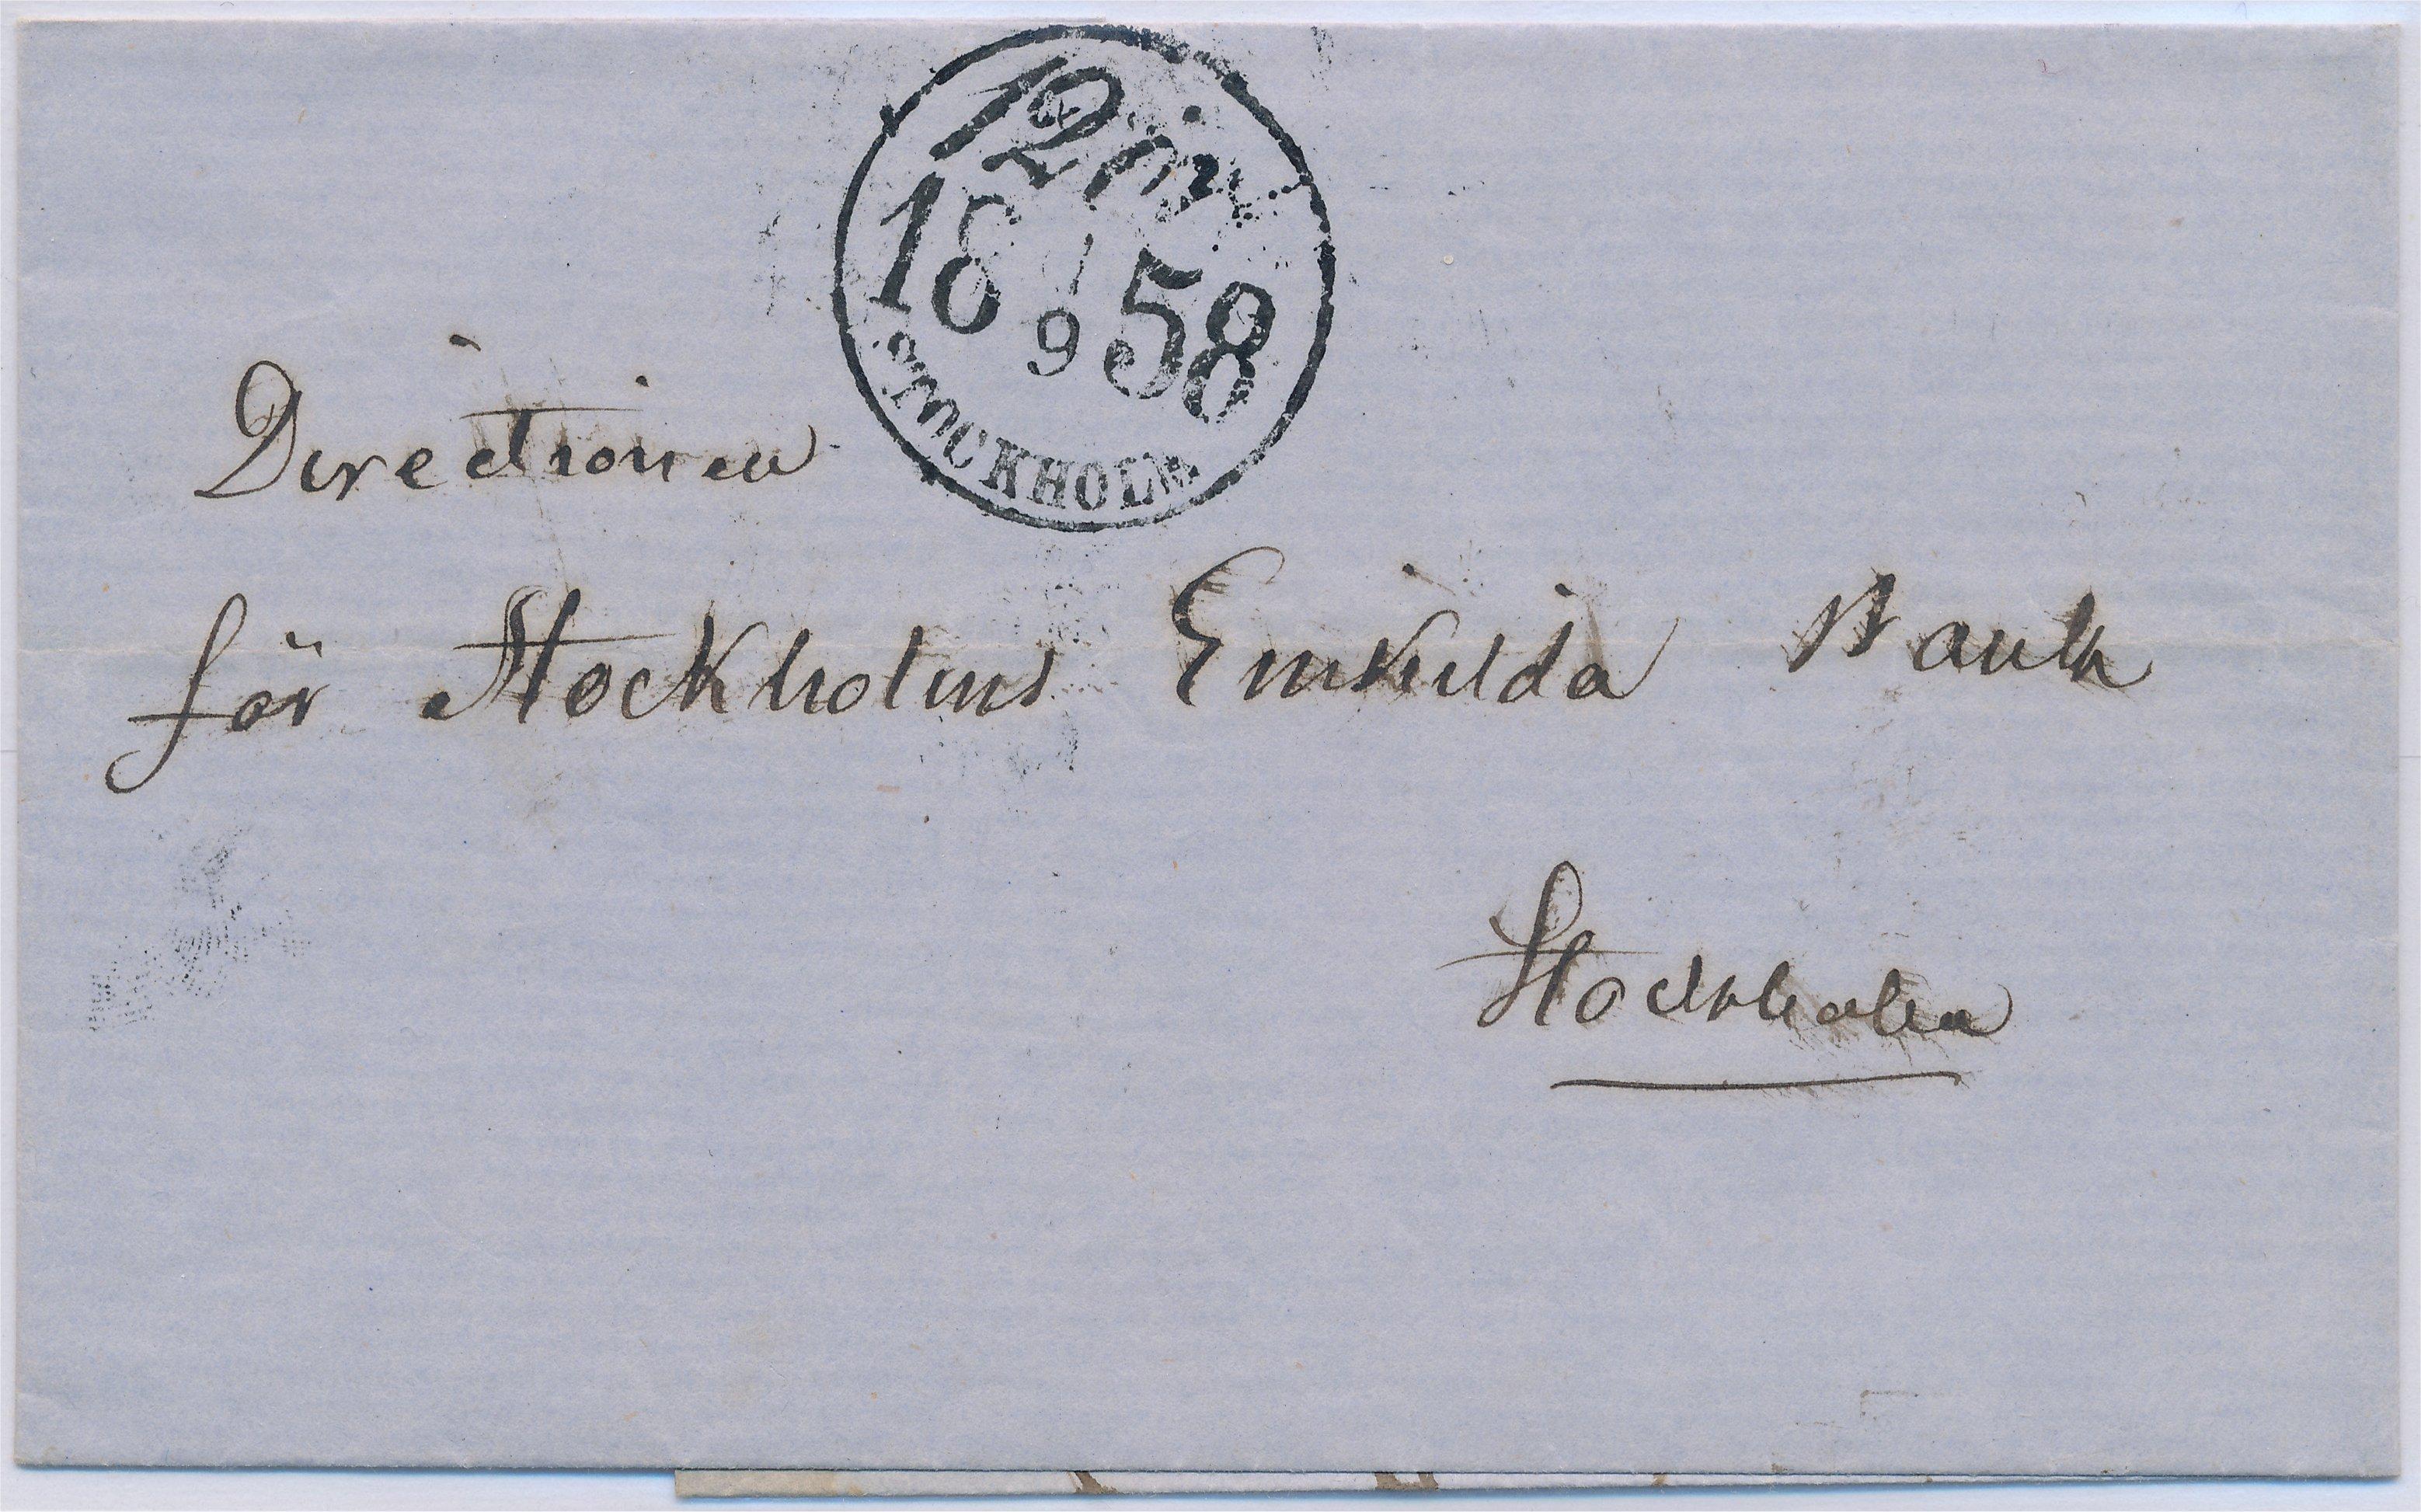 12_losen_stockholm_1_9_1858